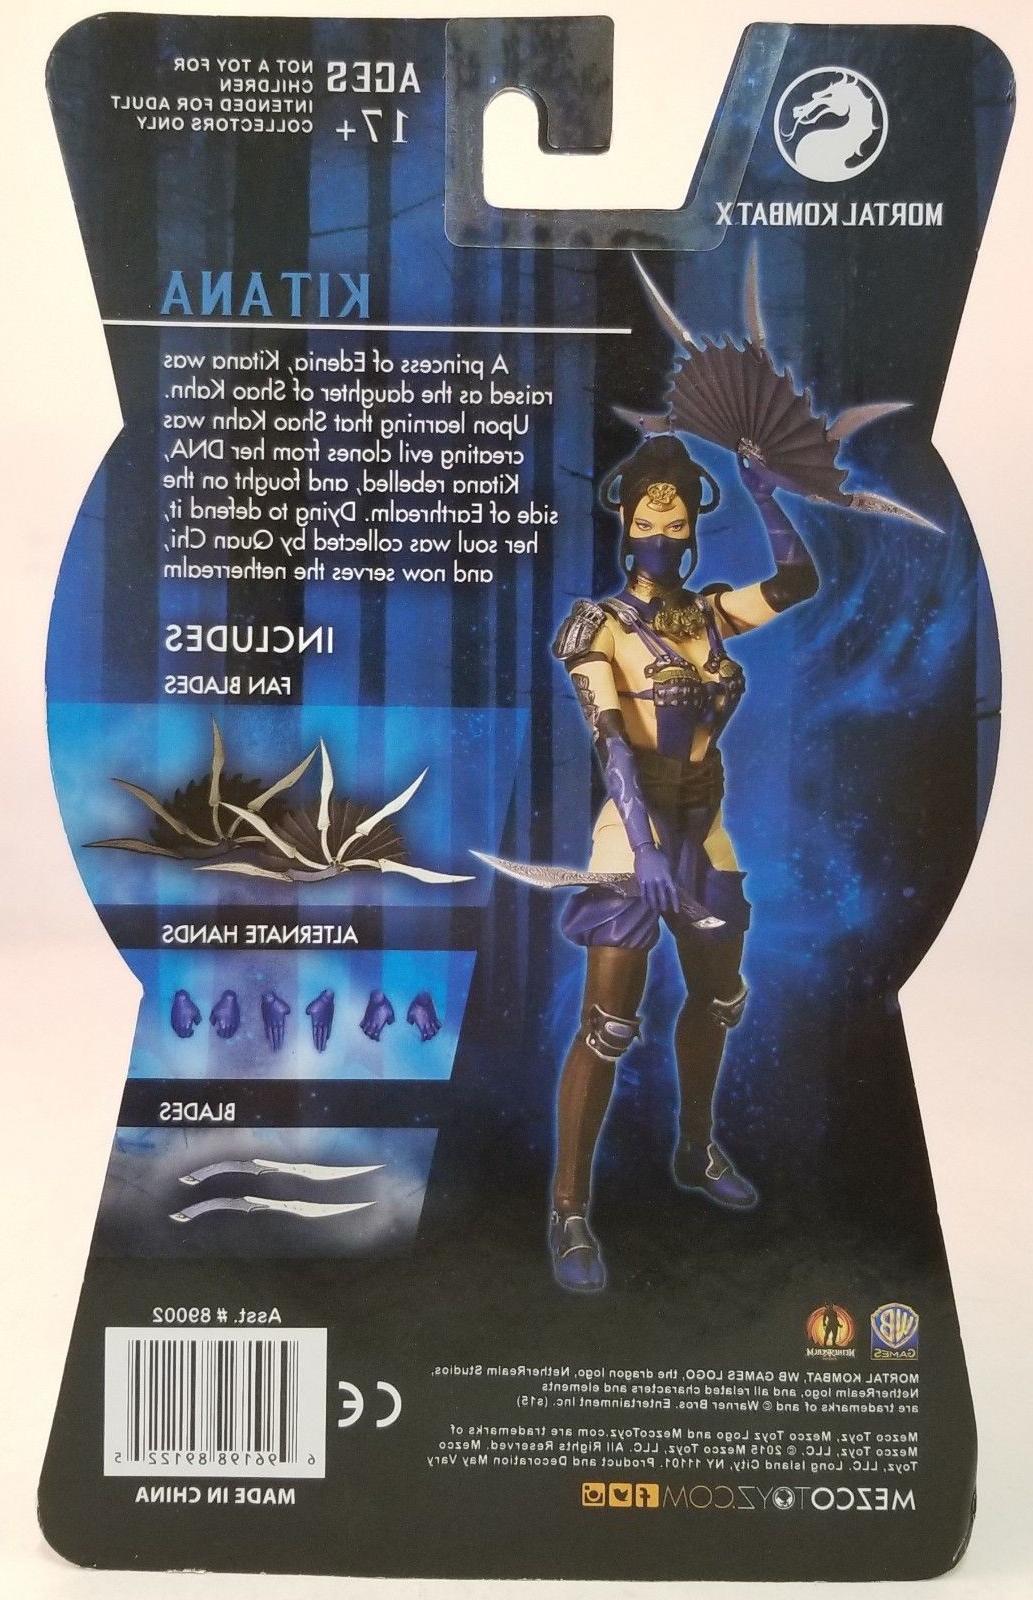 Lot of 2 Mortal Kombat Figures ~Kitana~Quan Chi~ PX Exclusive